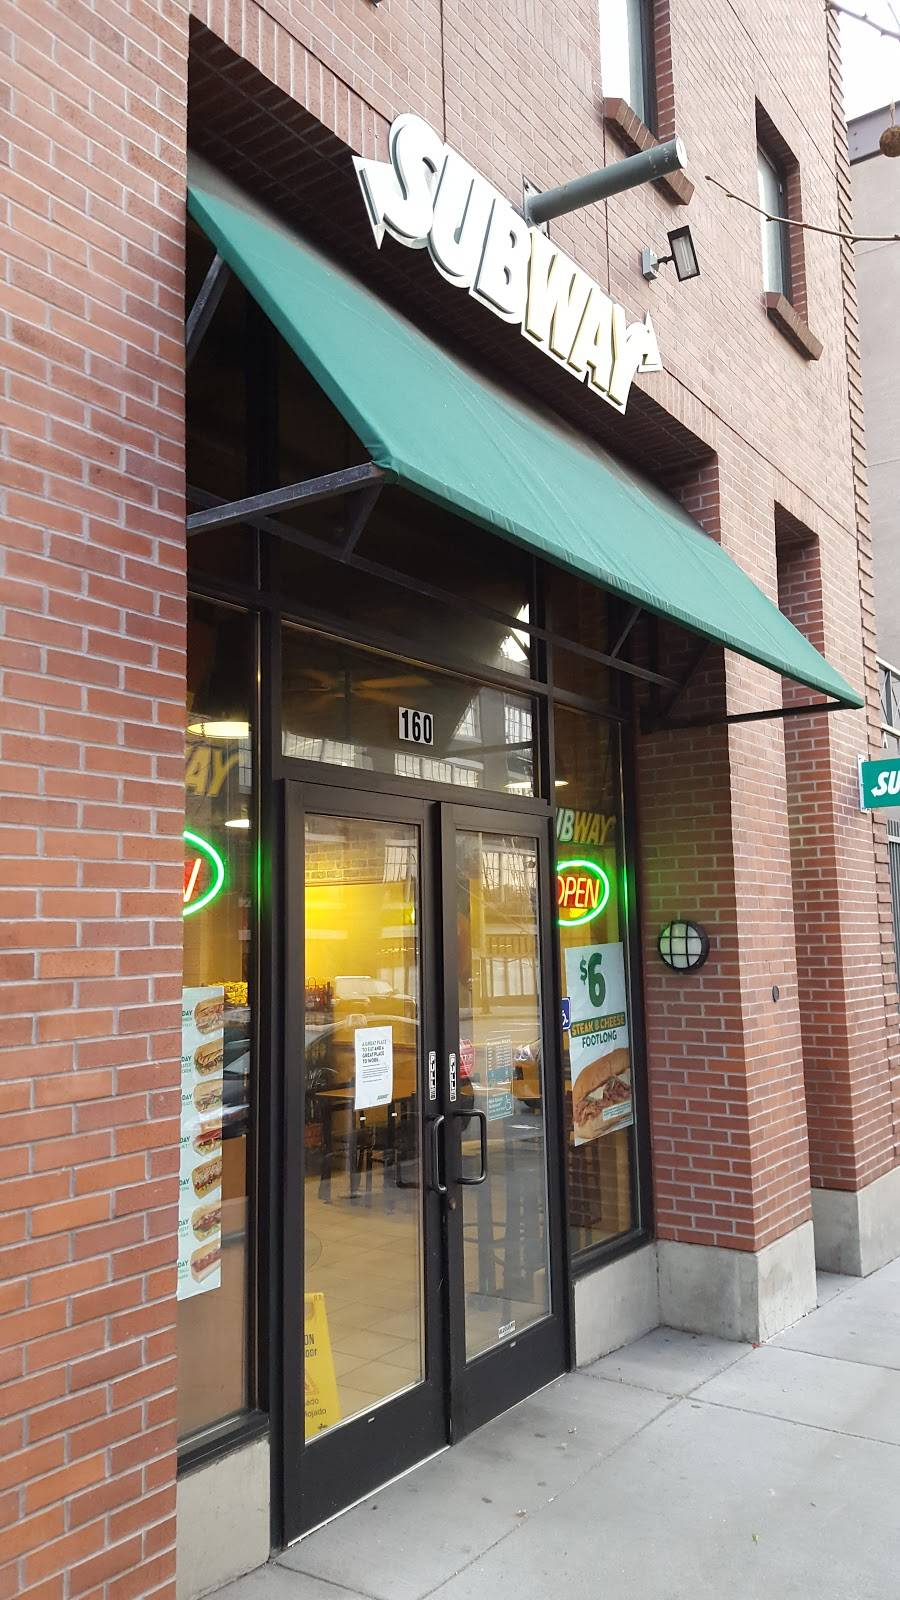 Subway Restaurants   restaurant   160 Broadway, San Francisco, CA 94111, USA   4153861913 OR +1 415-386-1913